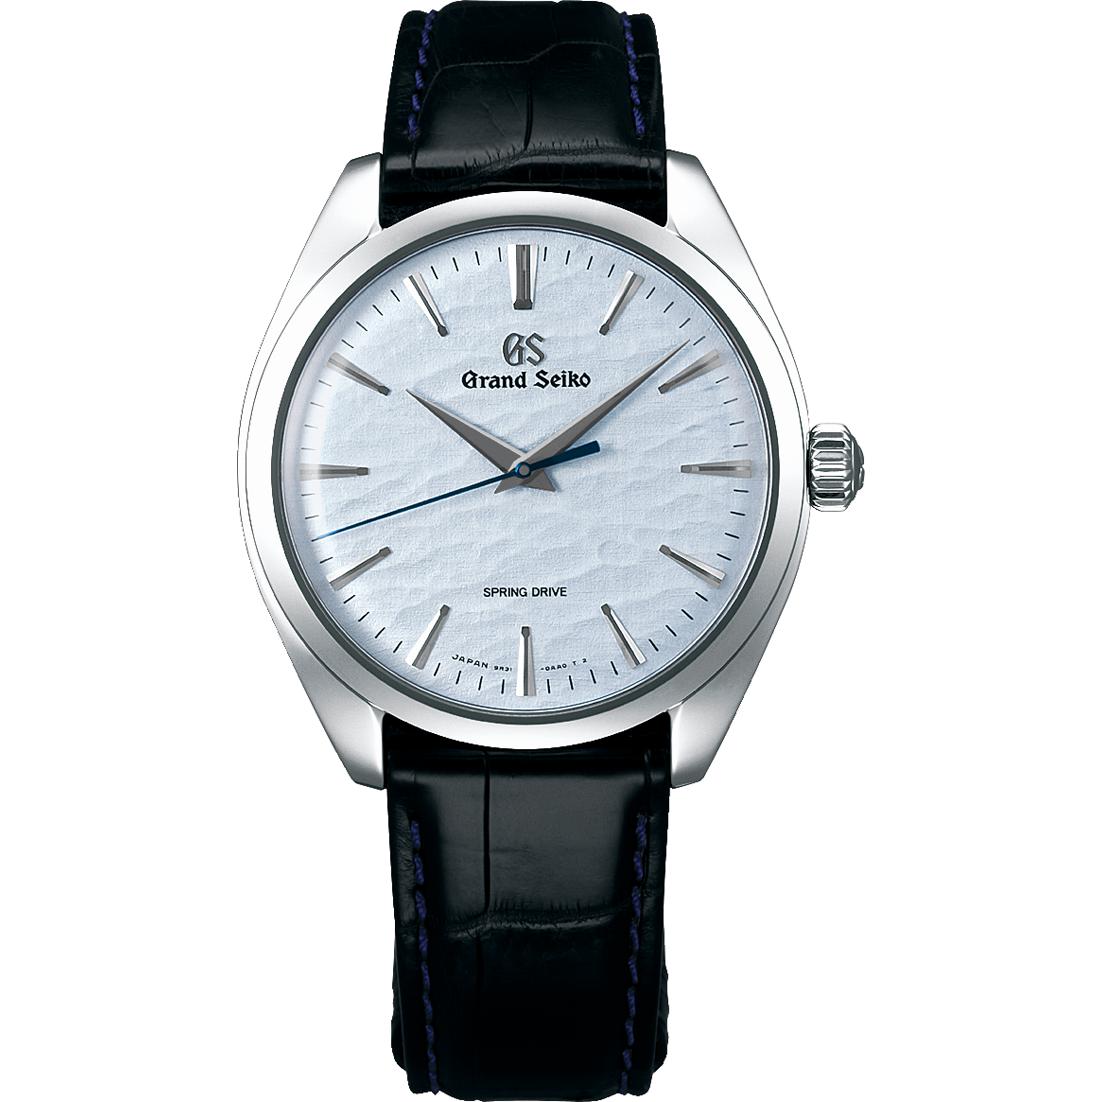 Grand Seiko SBGY007 blue dial men's wristwatch